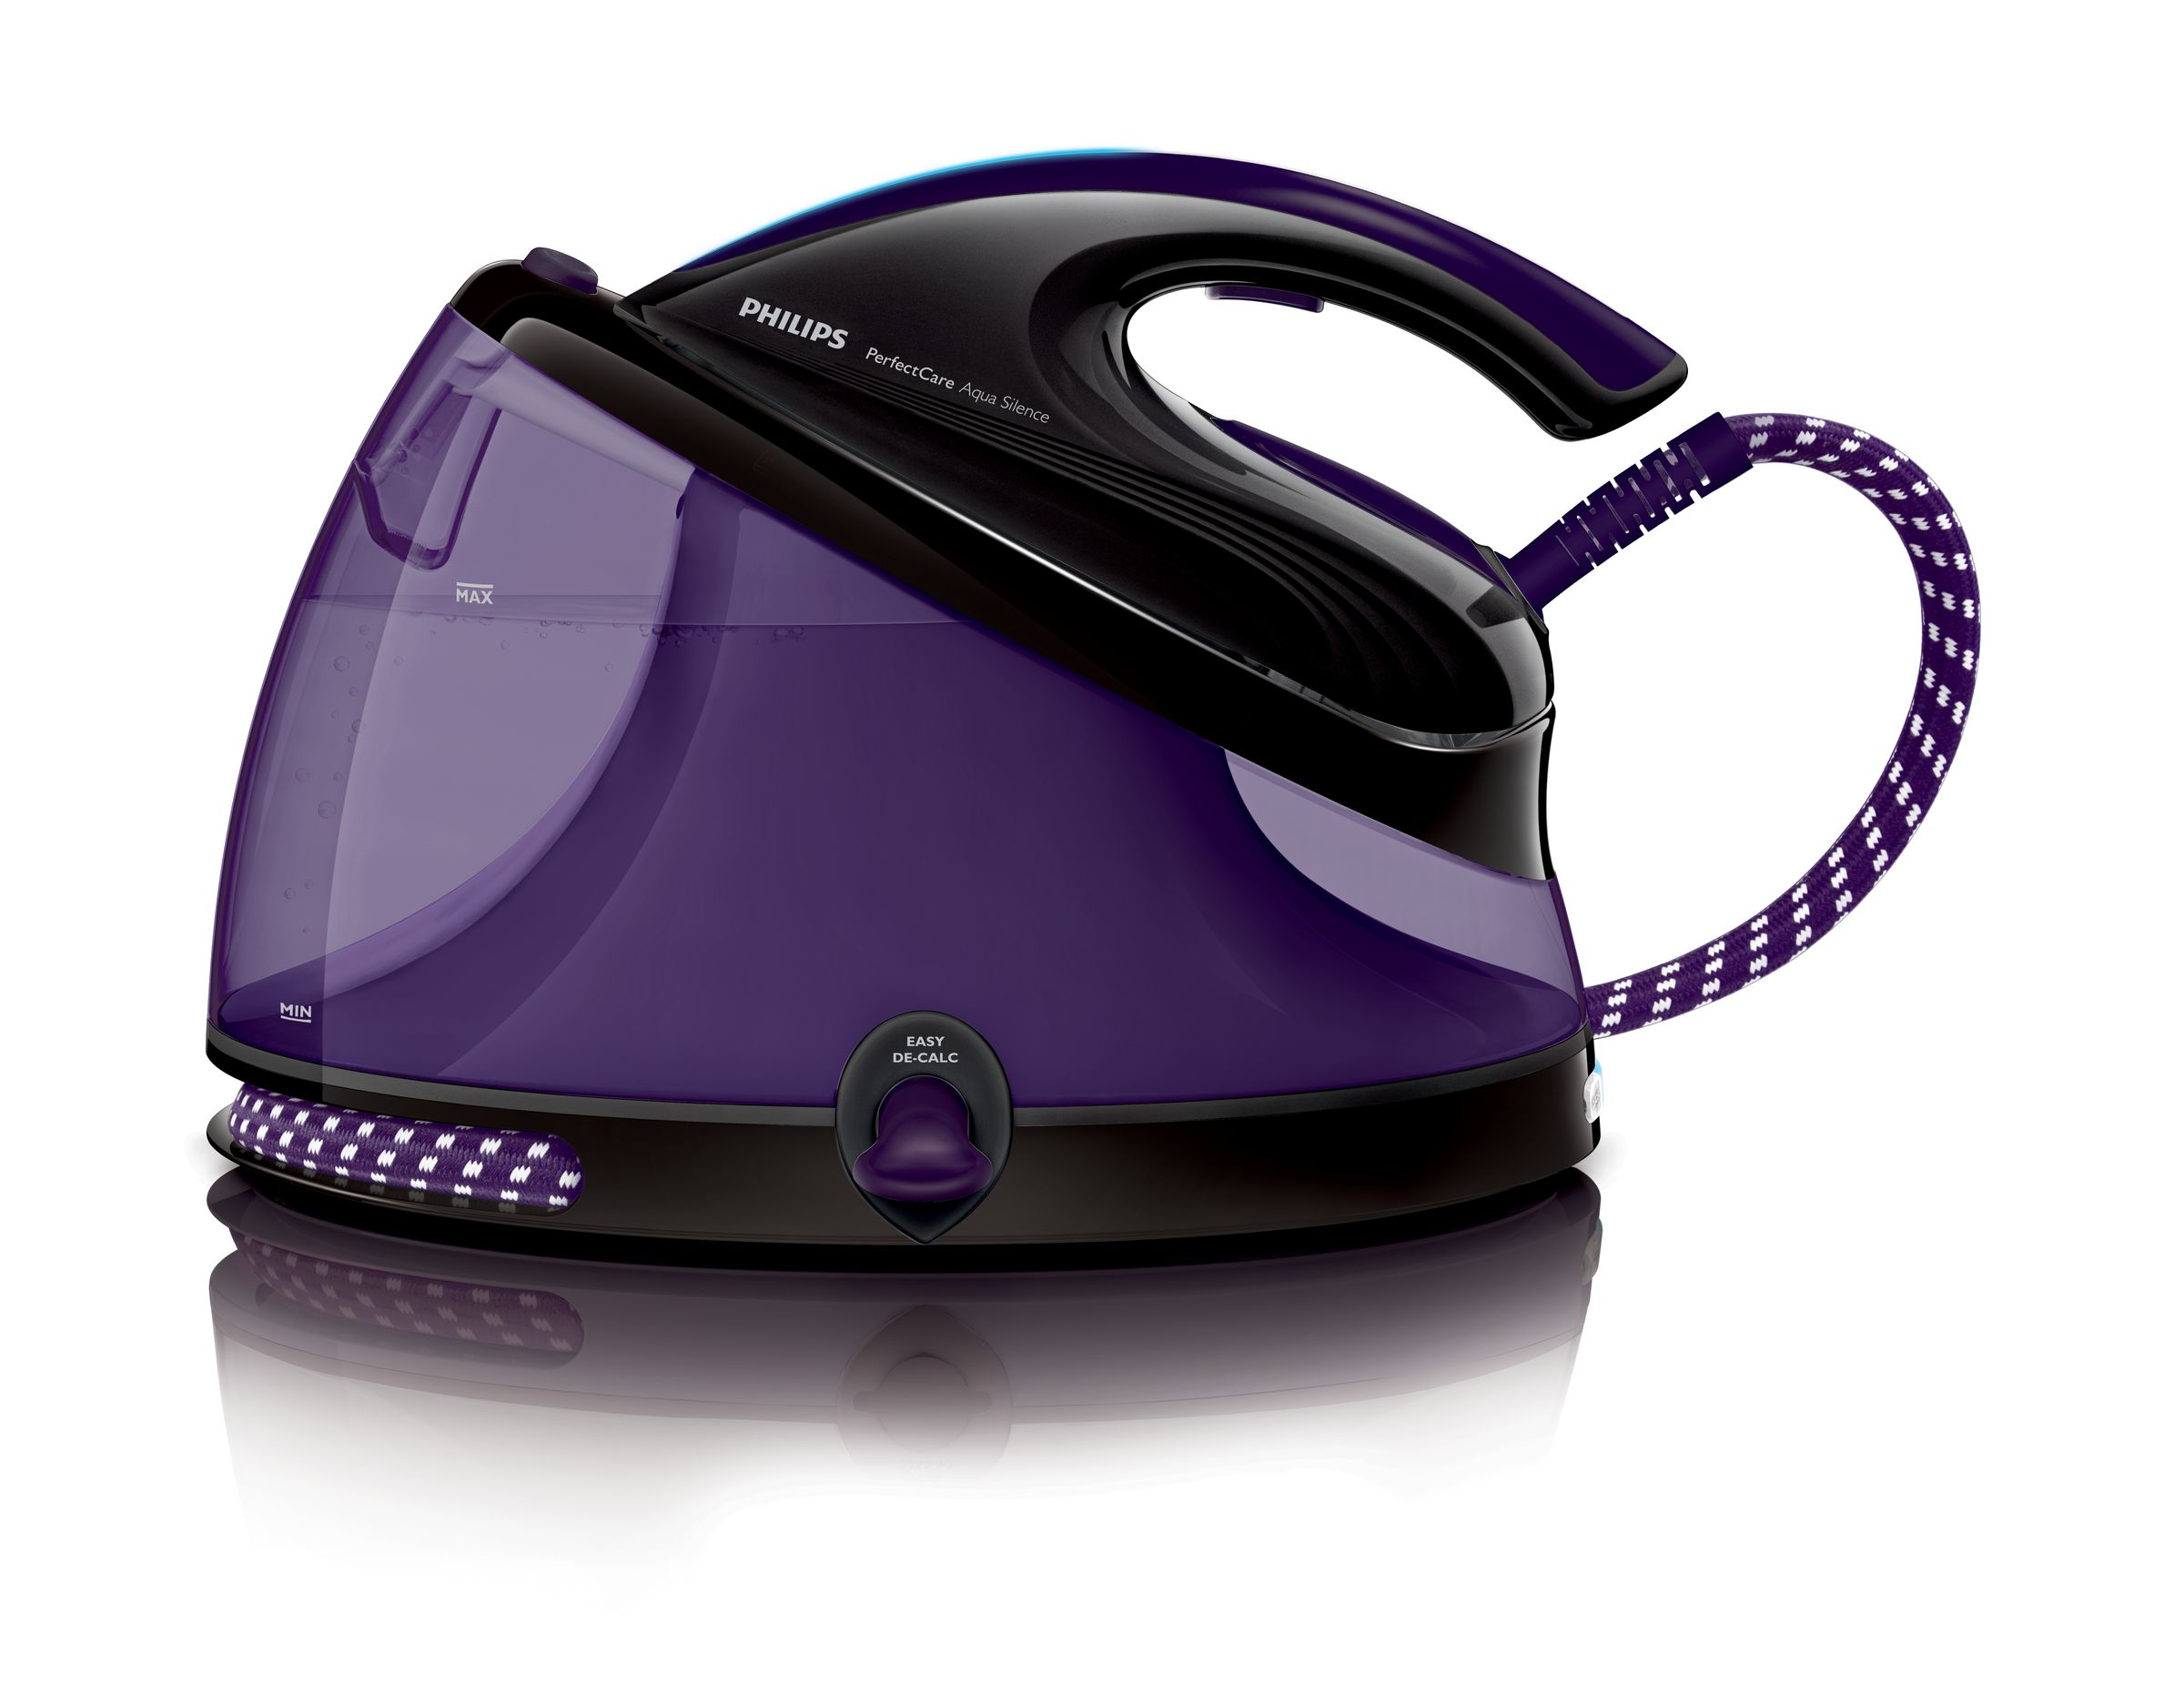 Philips PerfectCare Aqua Silence Steam generator iron